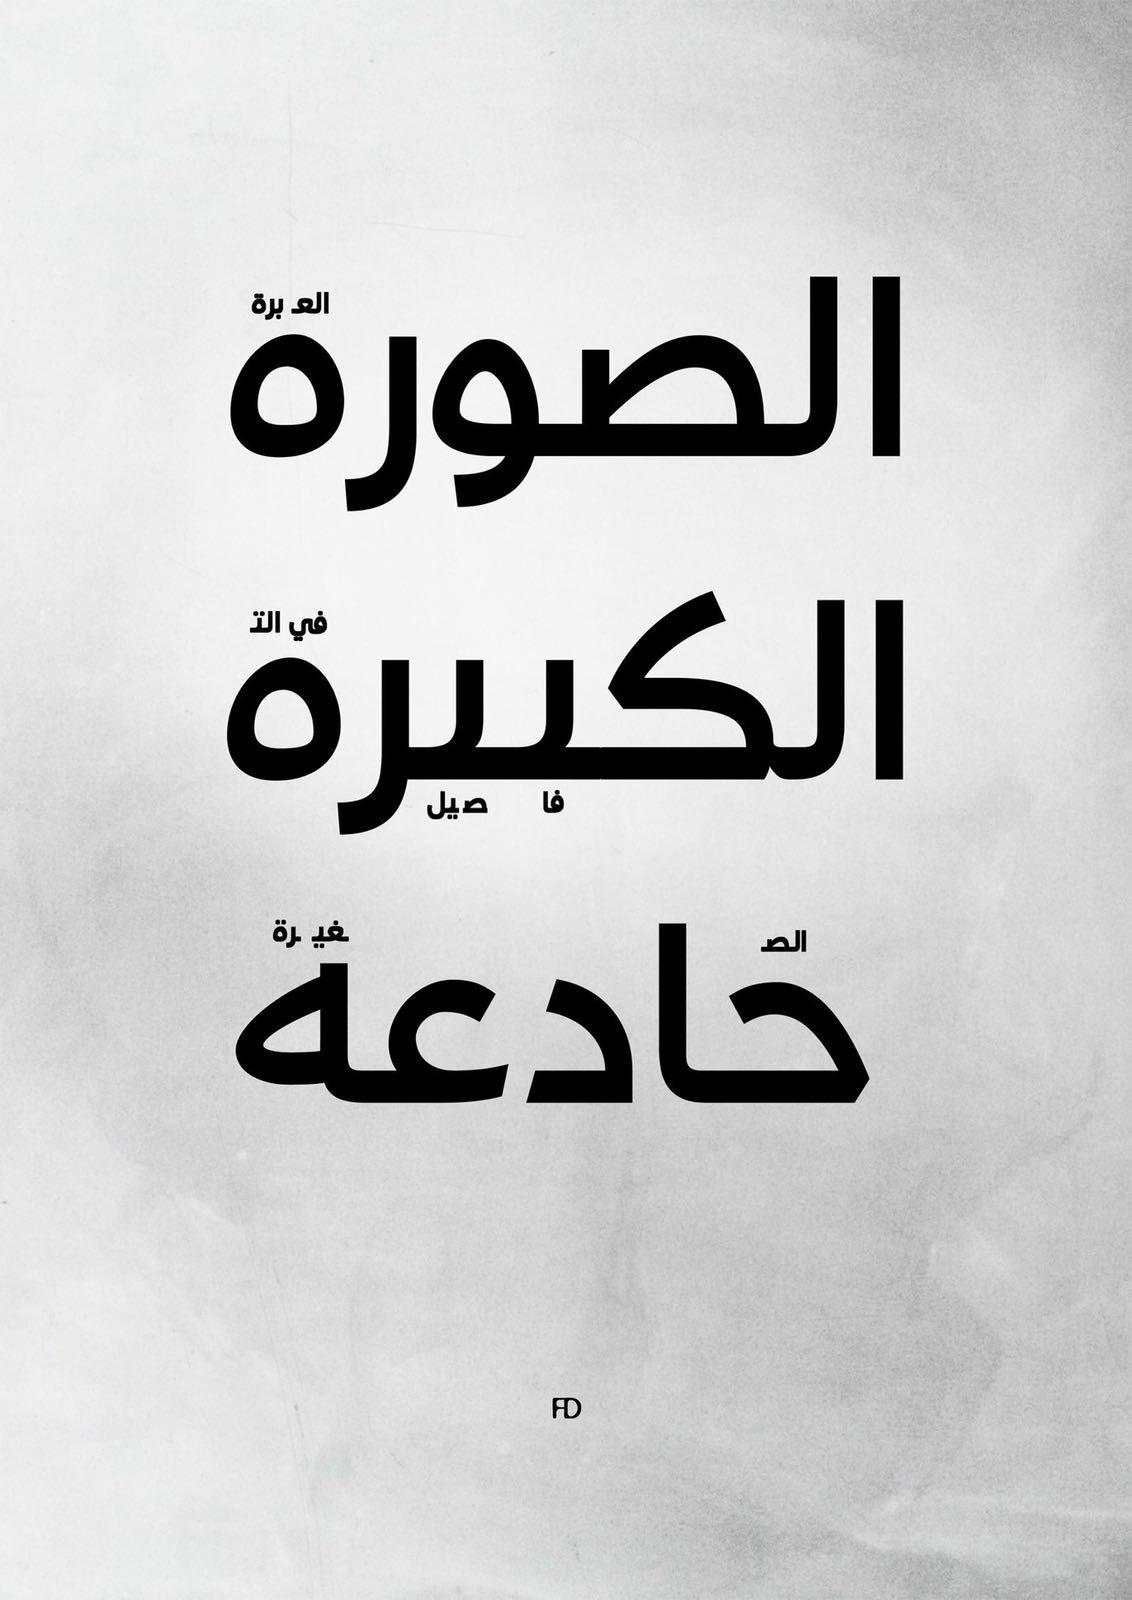 Pin By Chadi Almadramani On عبارات بالعربي Funny Arabic Quotes Quran Quotes Words Quotes